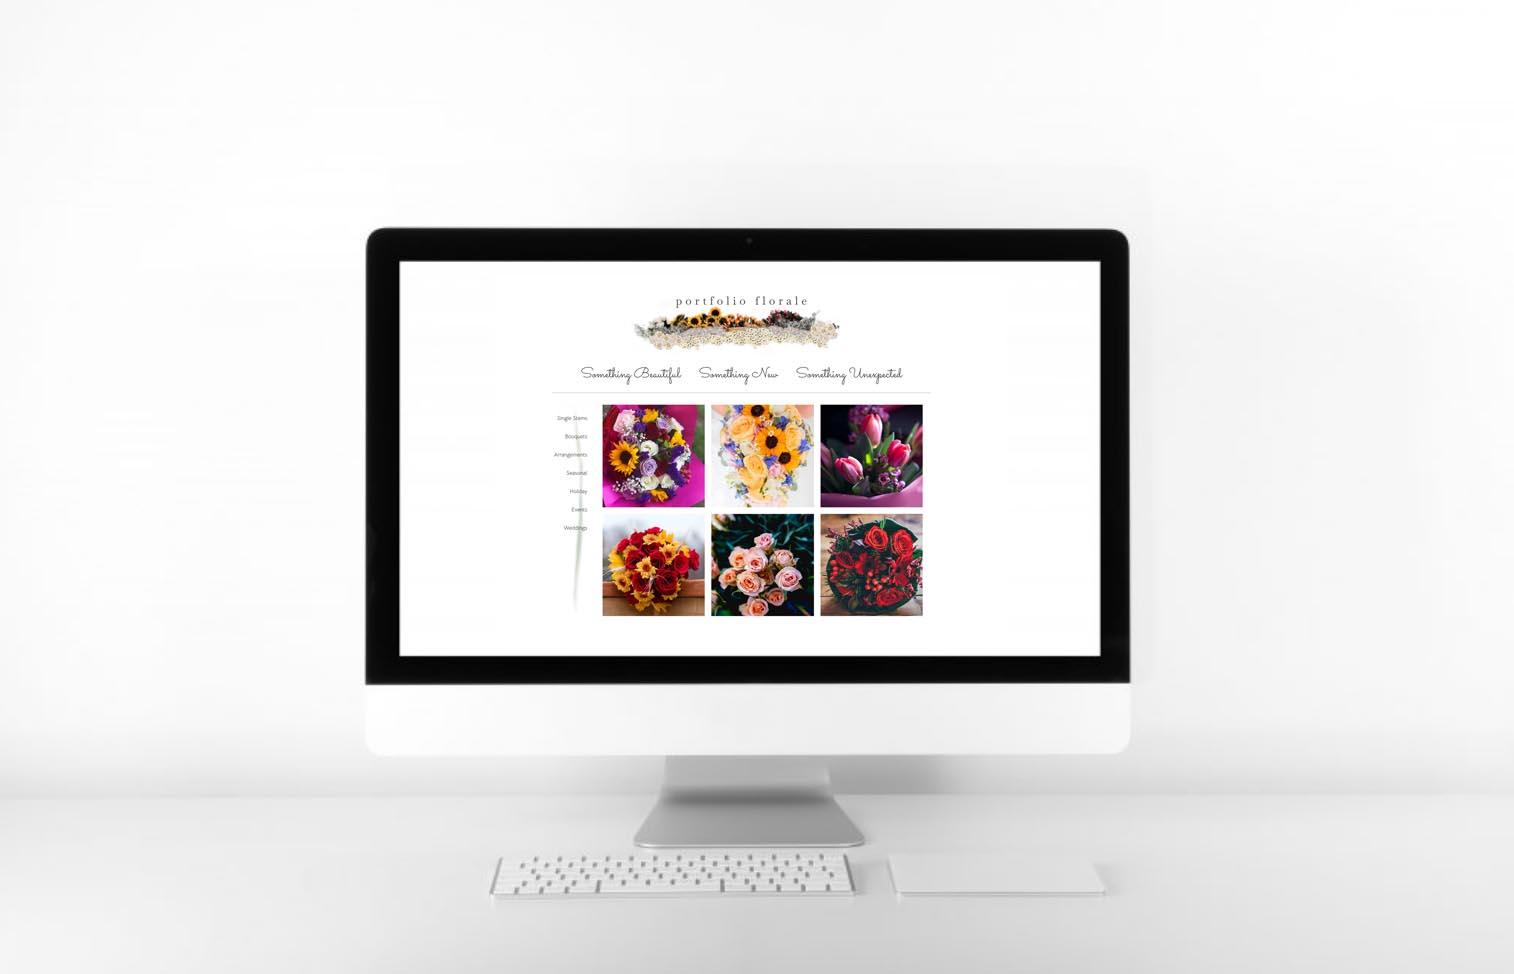 desktop-portfolio-florale-website-design-company